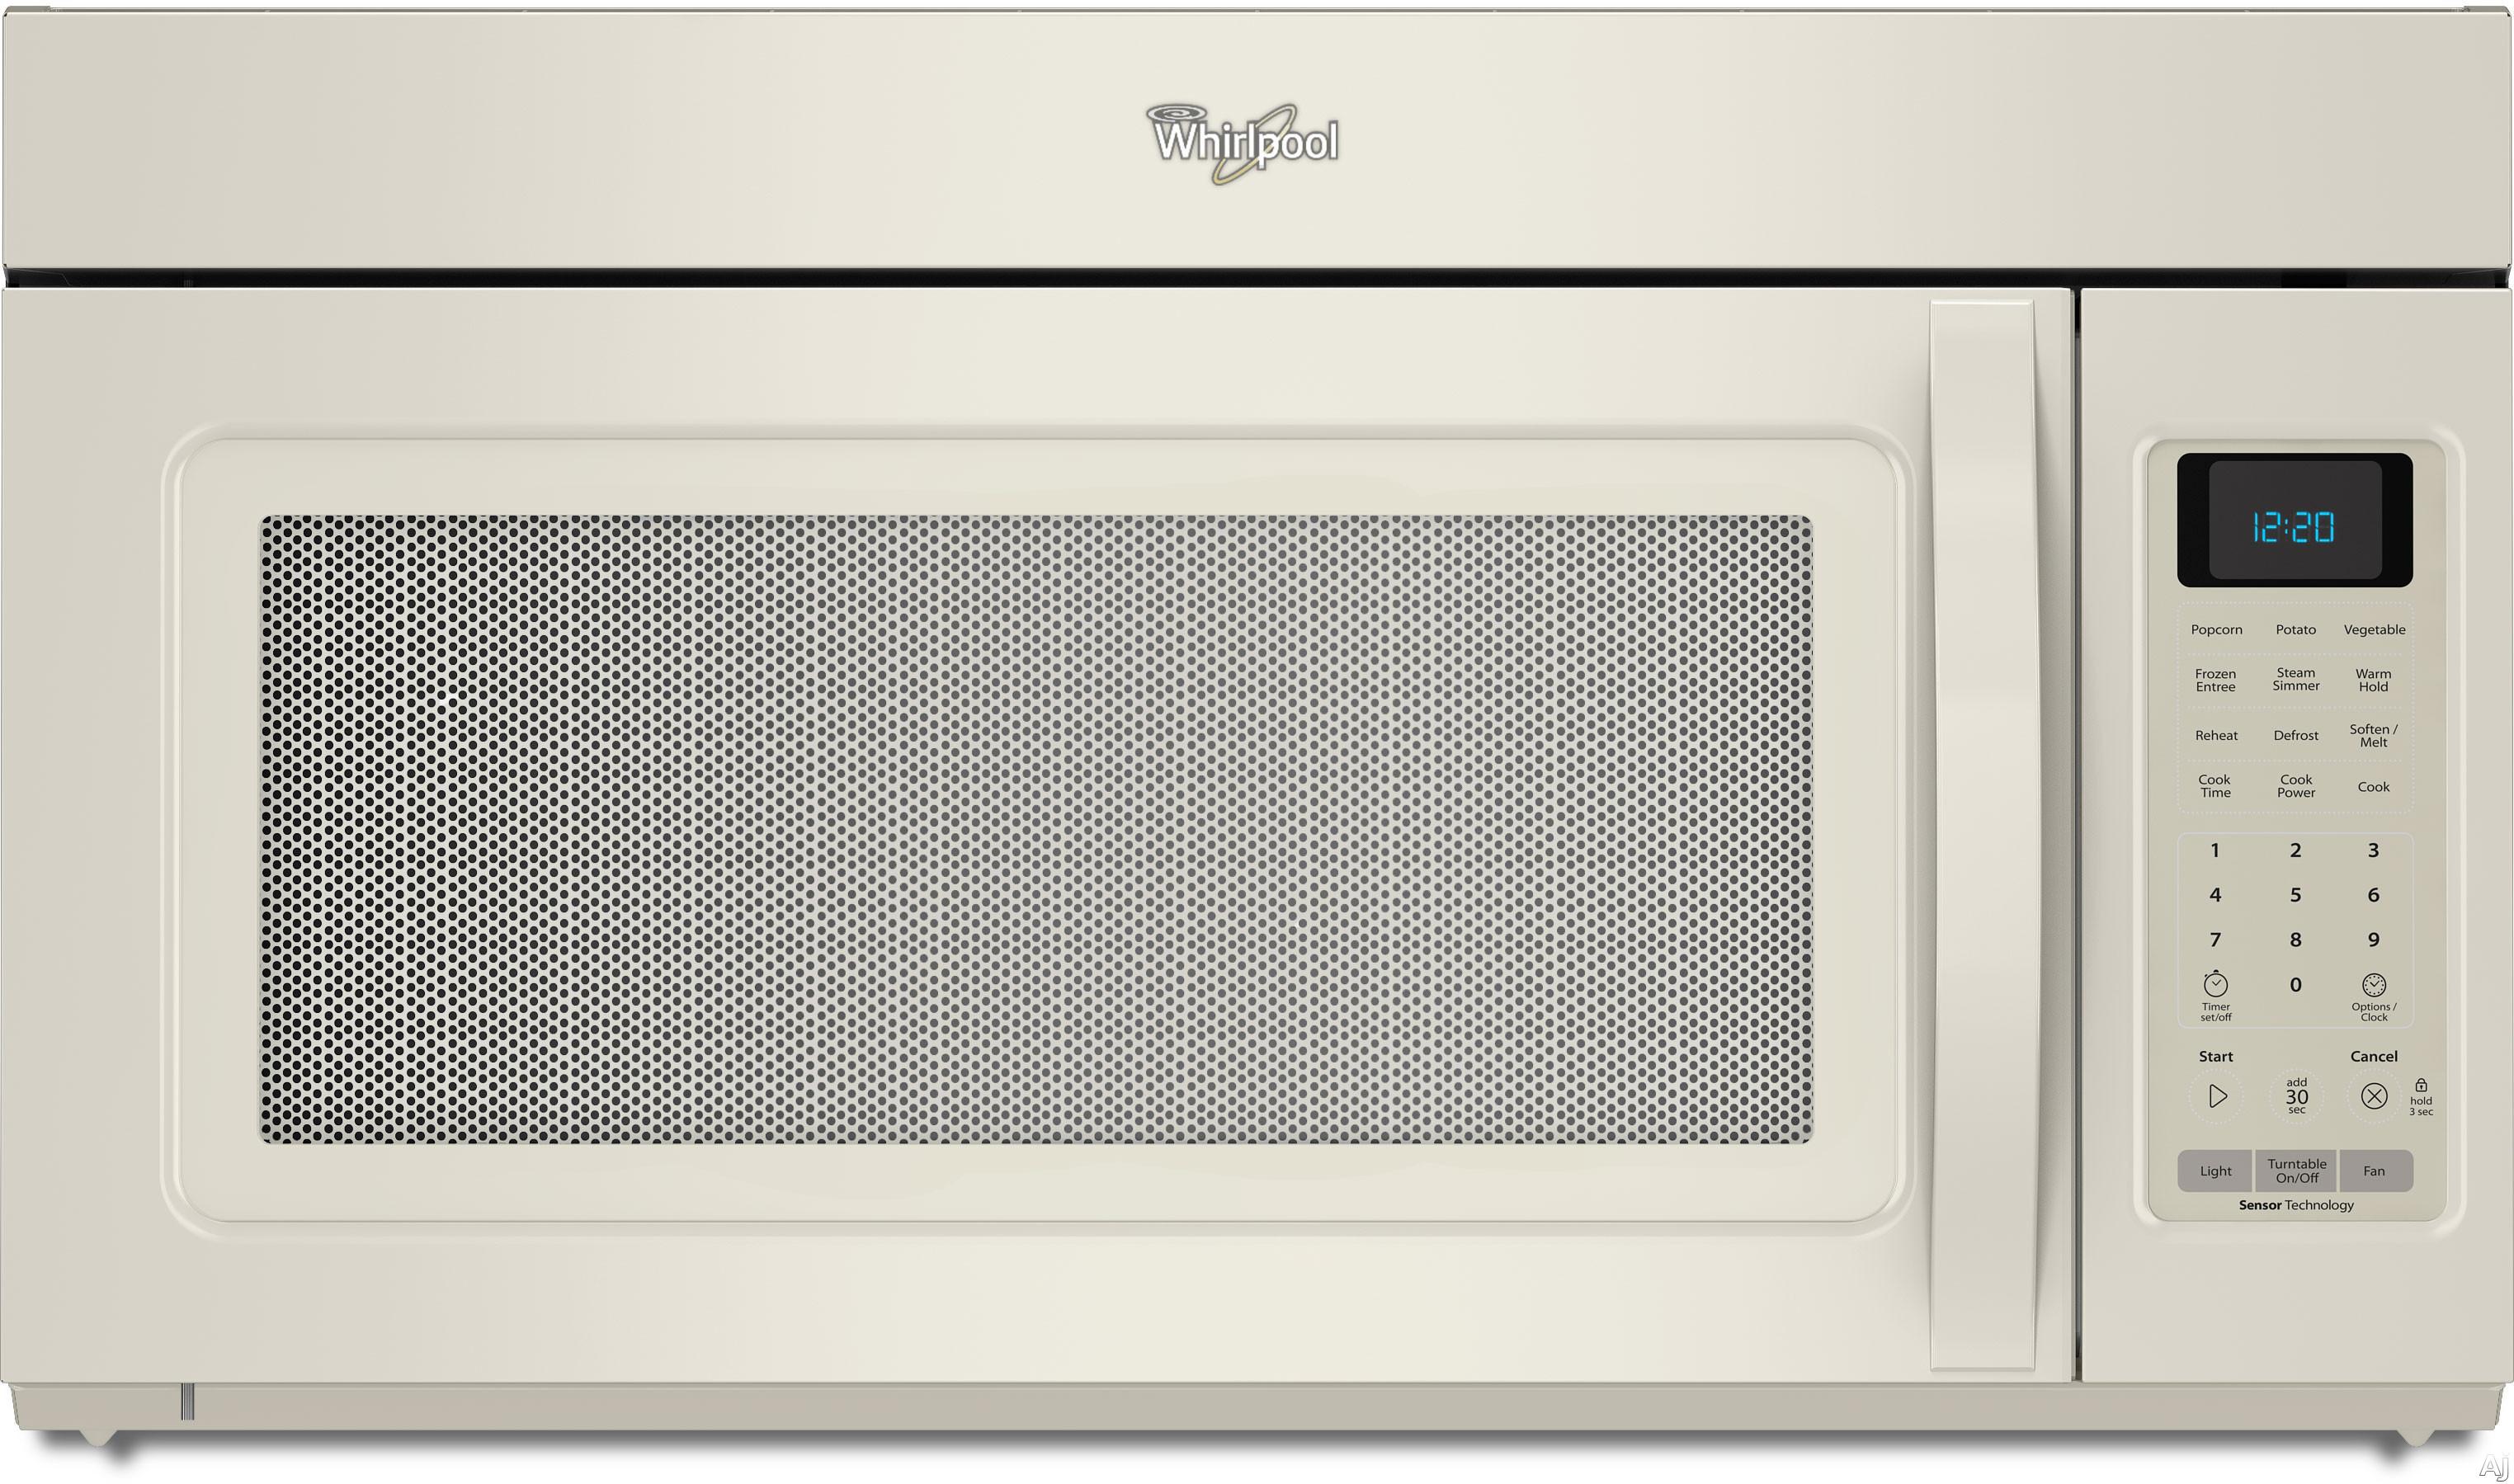 Whirlpool Wmh32519c 1 9 Cu Ft Over The Range Microwave